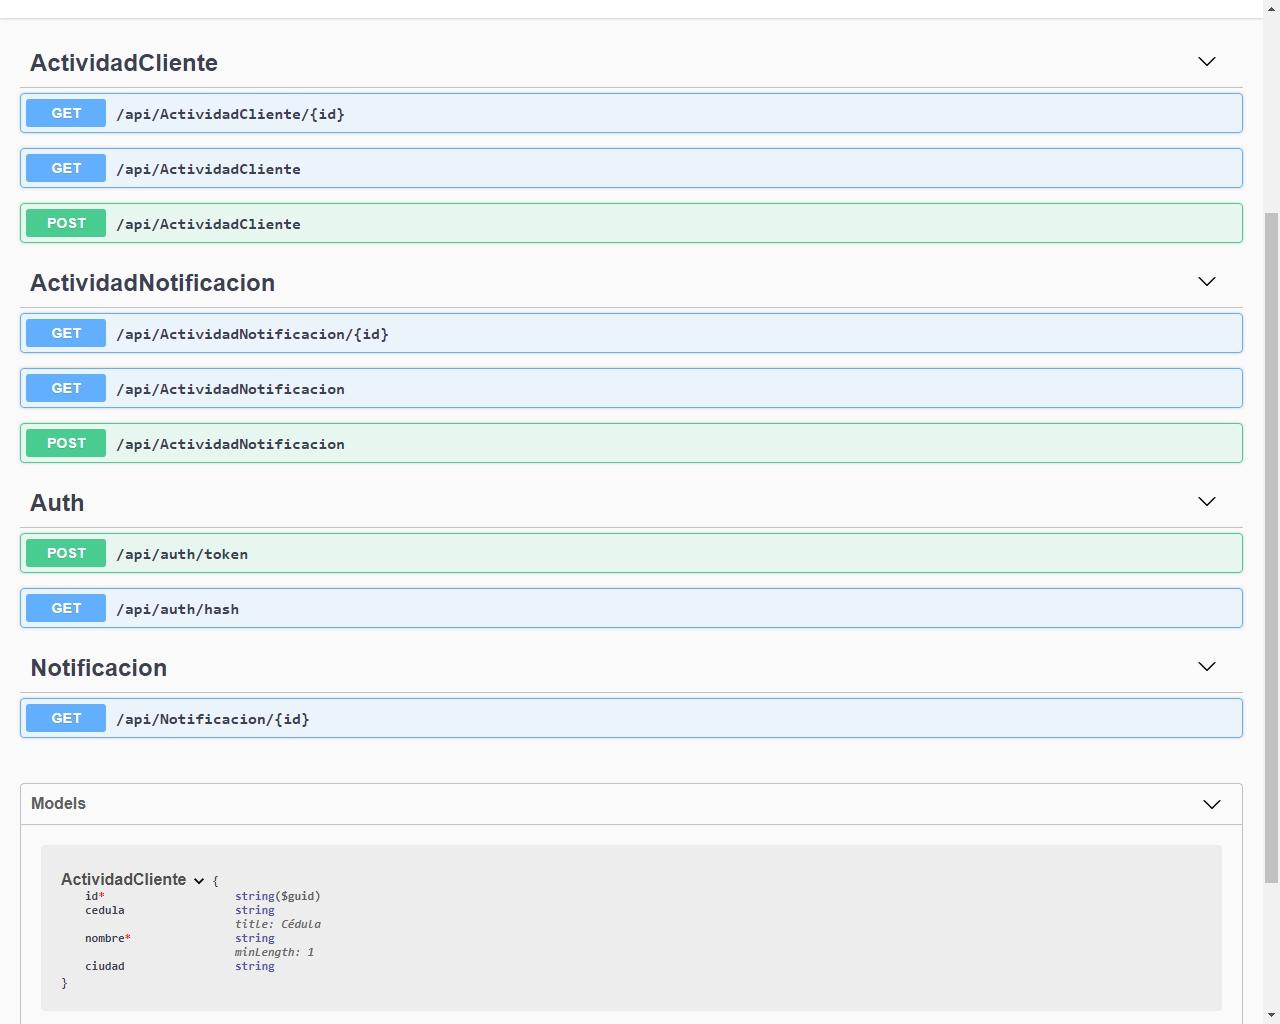 API para registrar cualquier actividad móvil